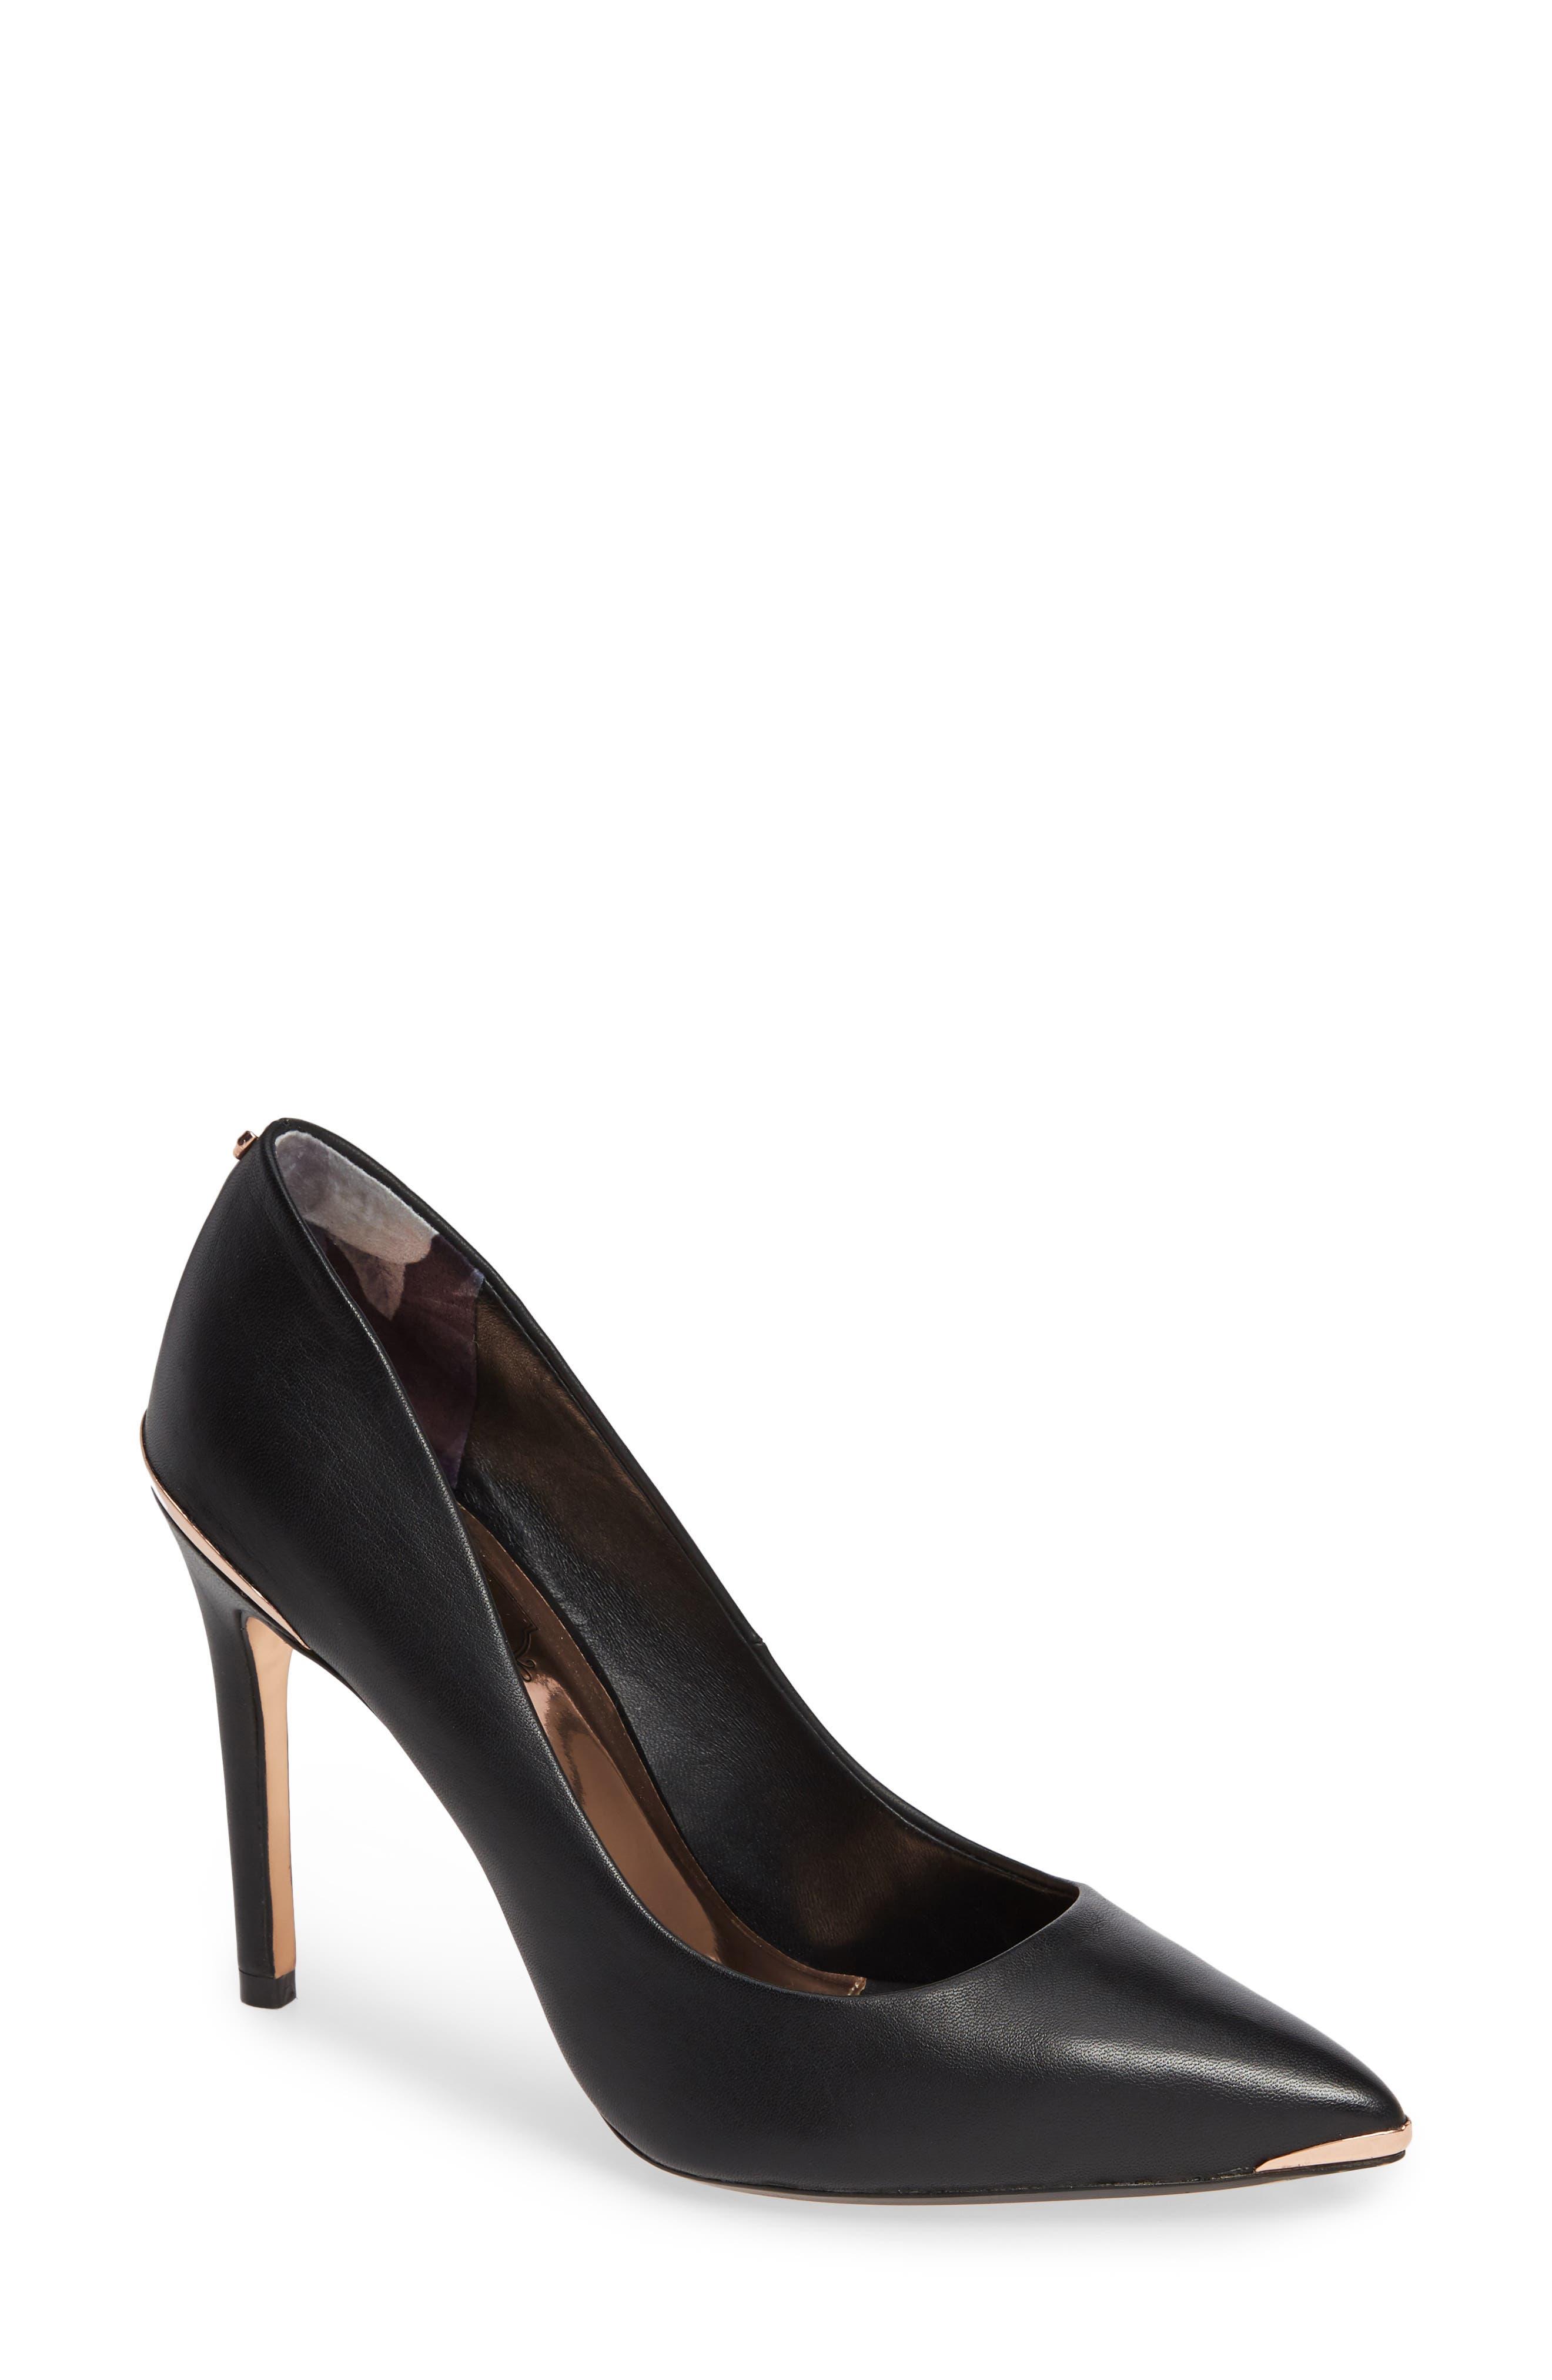 Women's Ted Baker London Shoes   Nordstrom